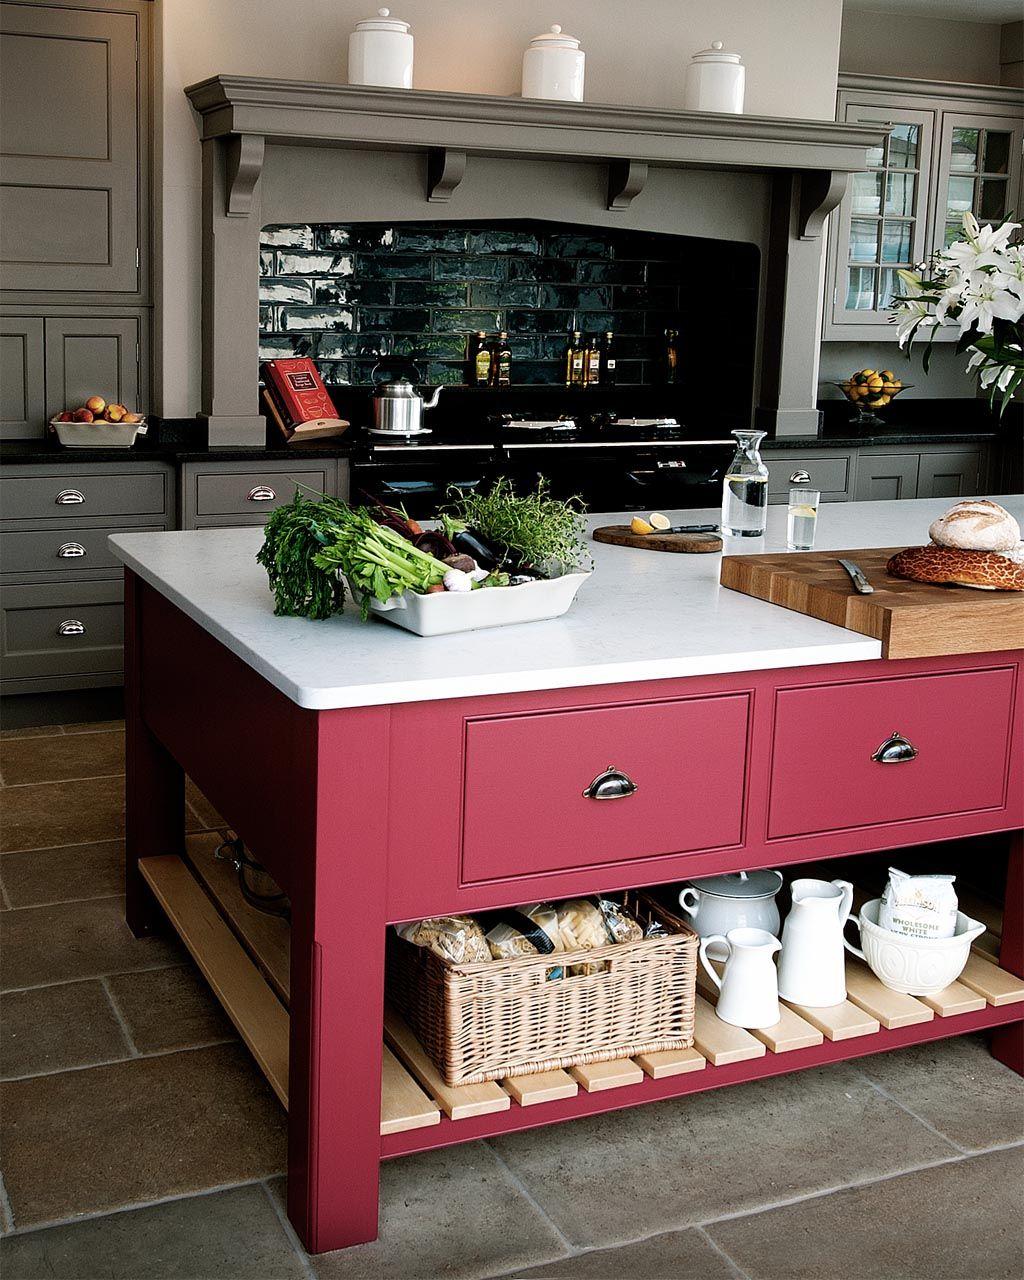 Beautifully designed bespoke kitchens boot room design for Bespoke kitchen cabinets